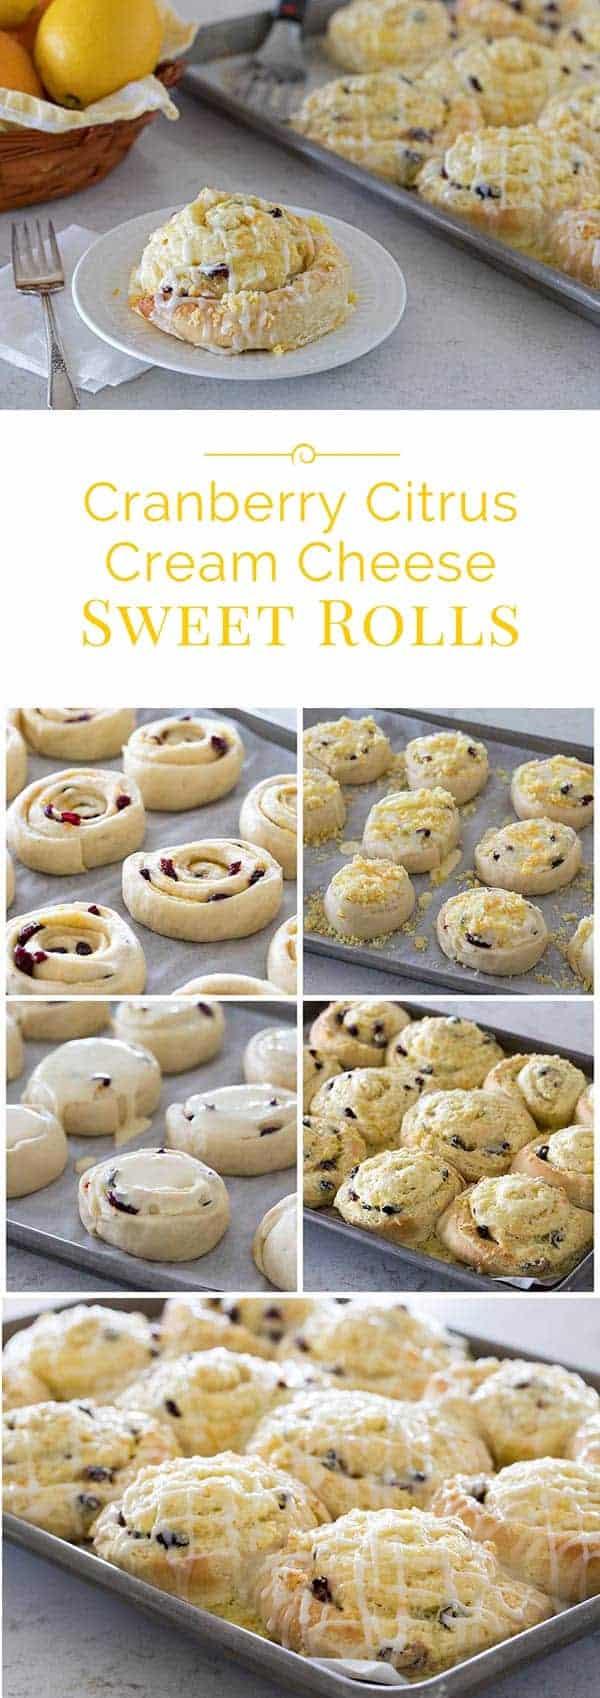 Citrus-Cream-Cheese-Sweet-Rolls-Pinterest-Collage